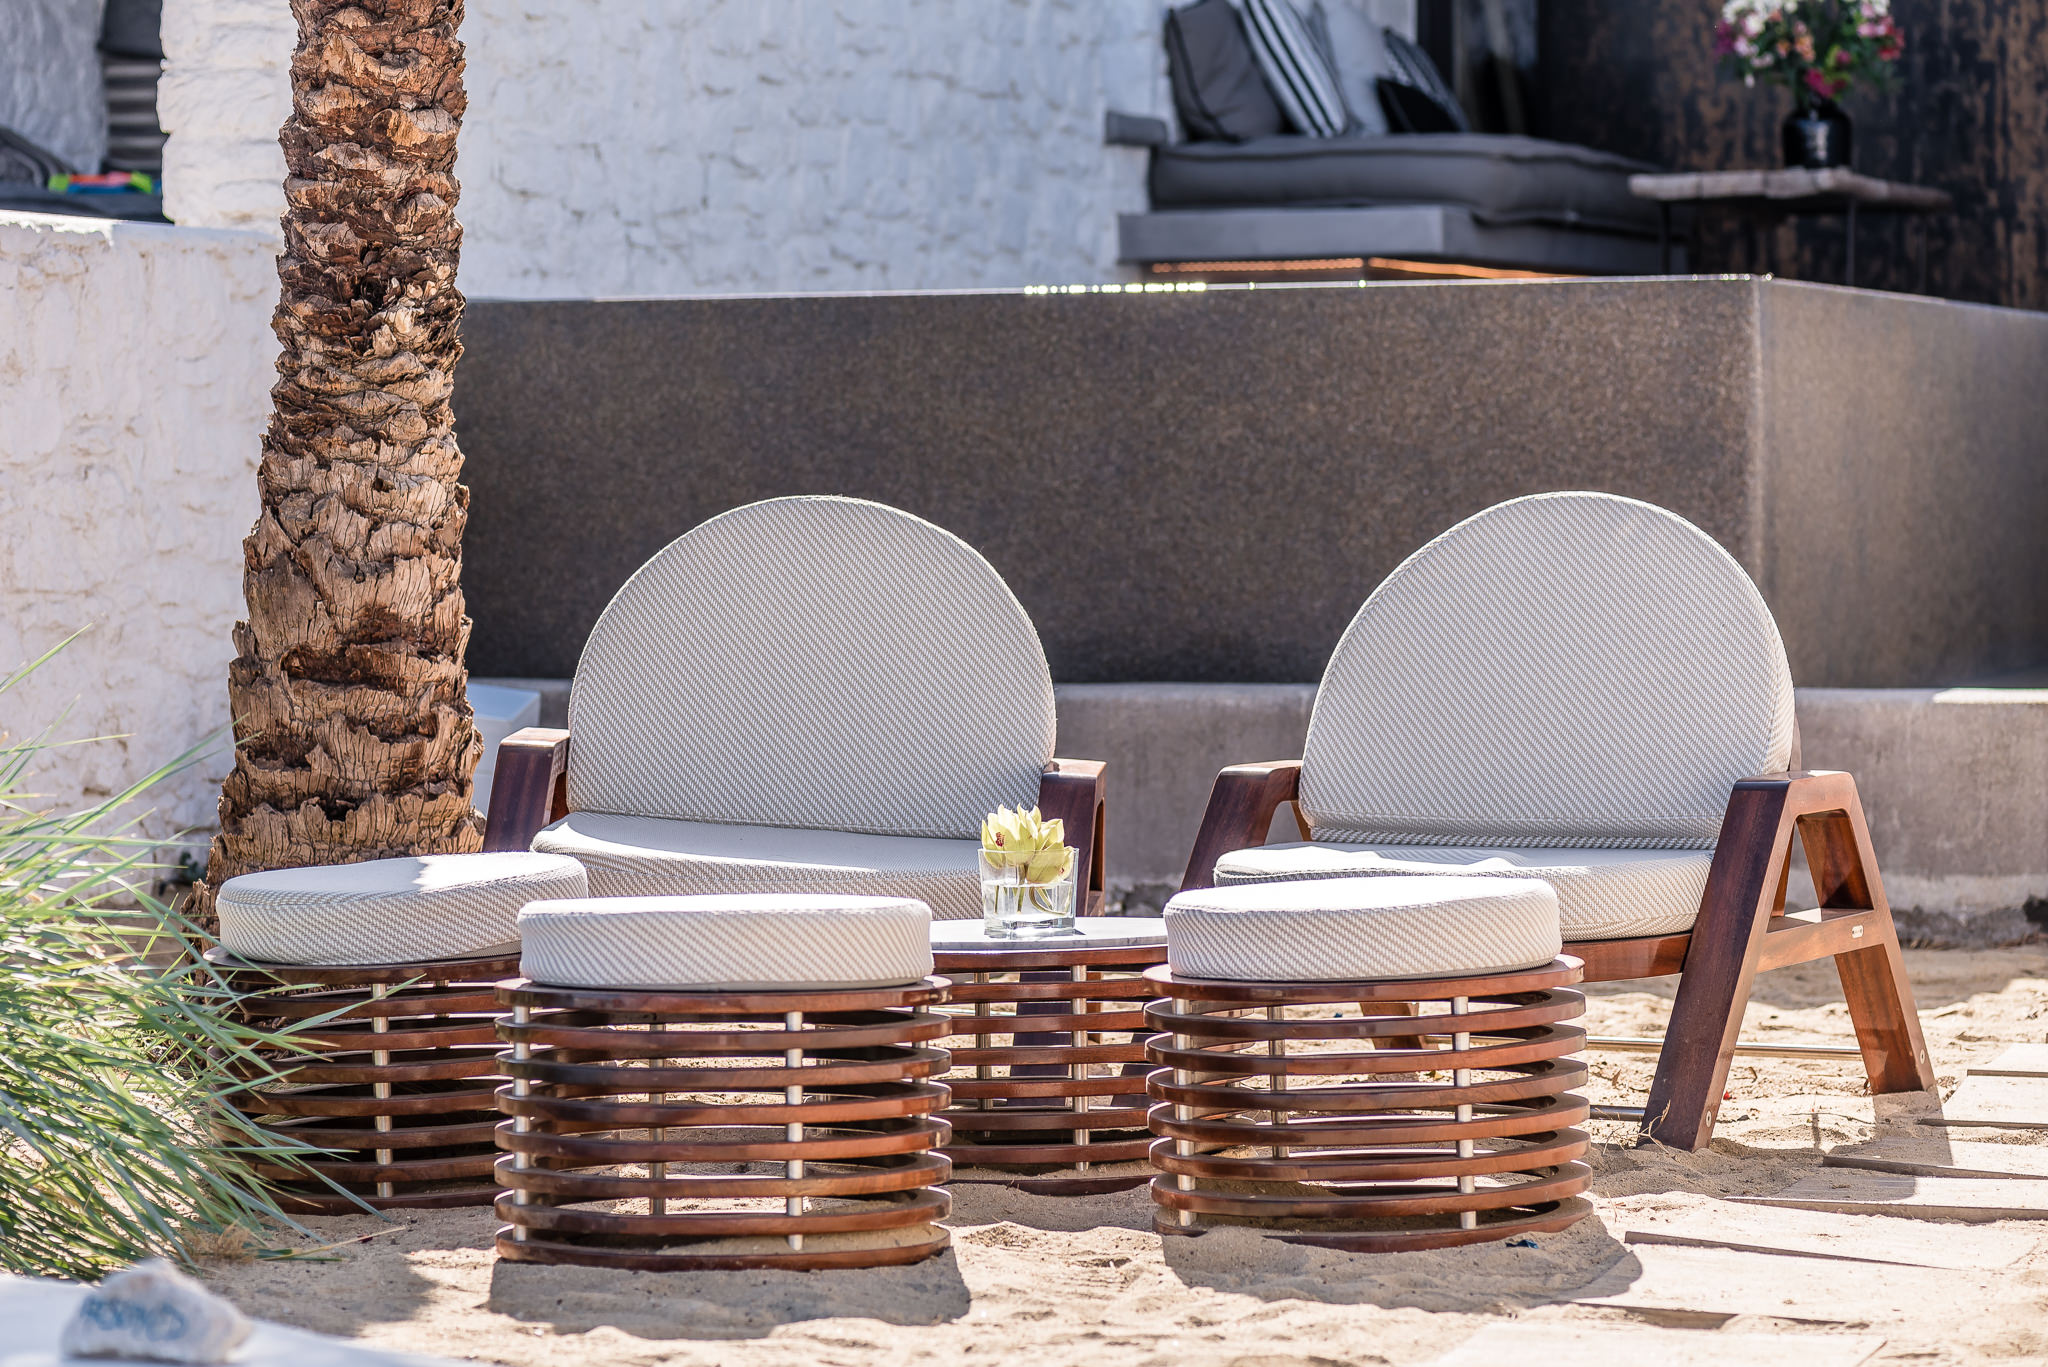 Seora Nammos Mykonos Beach Project with Azure deck chairs, Portofino stools and Brera side table - Masha Shapiro Agency UK.jpg